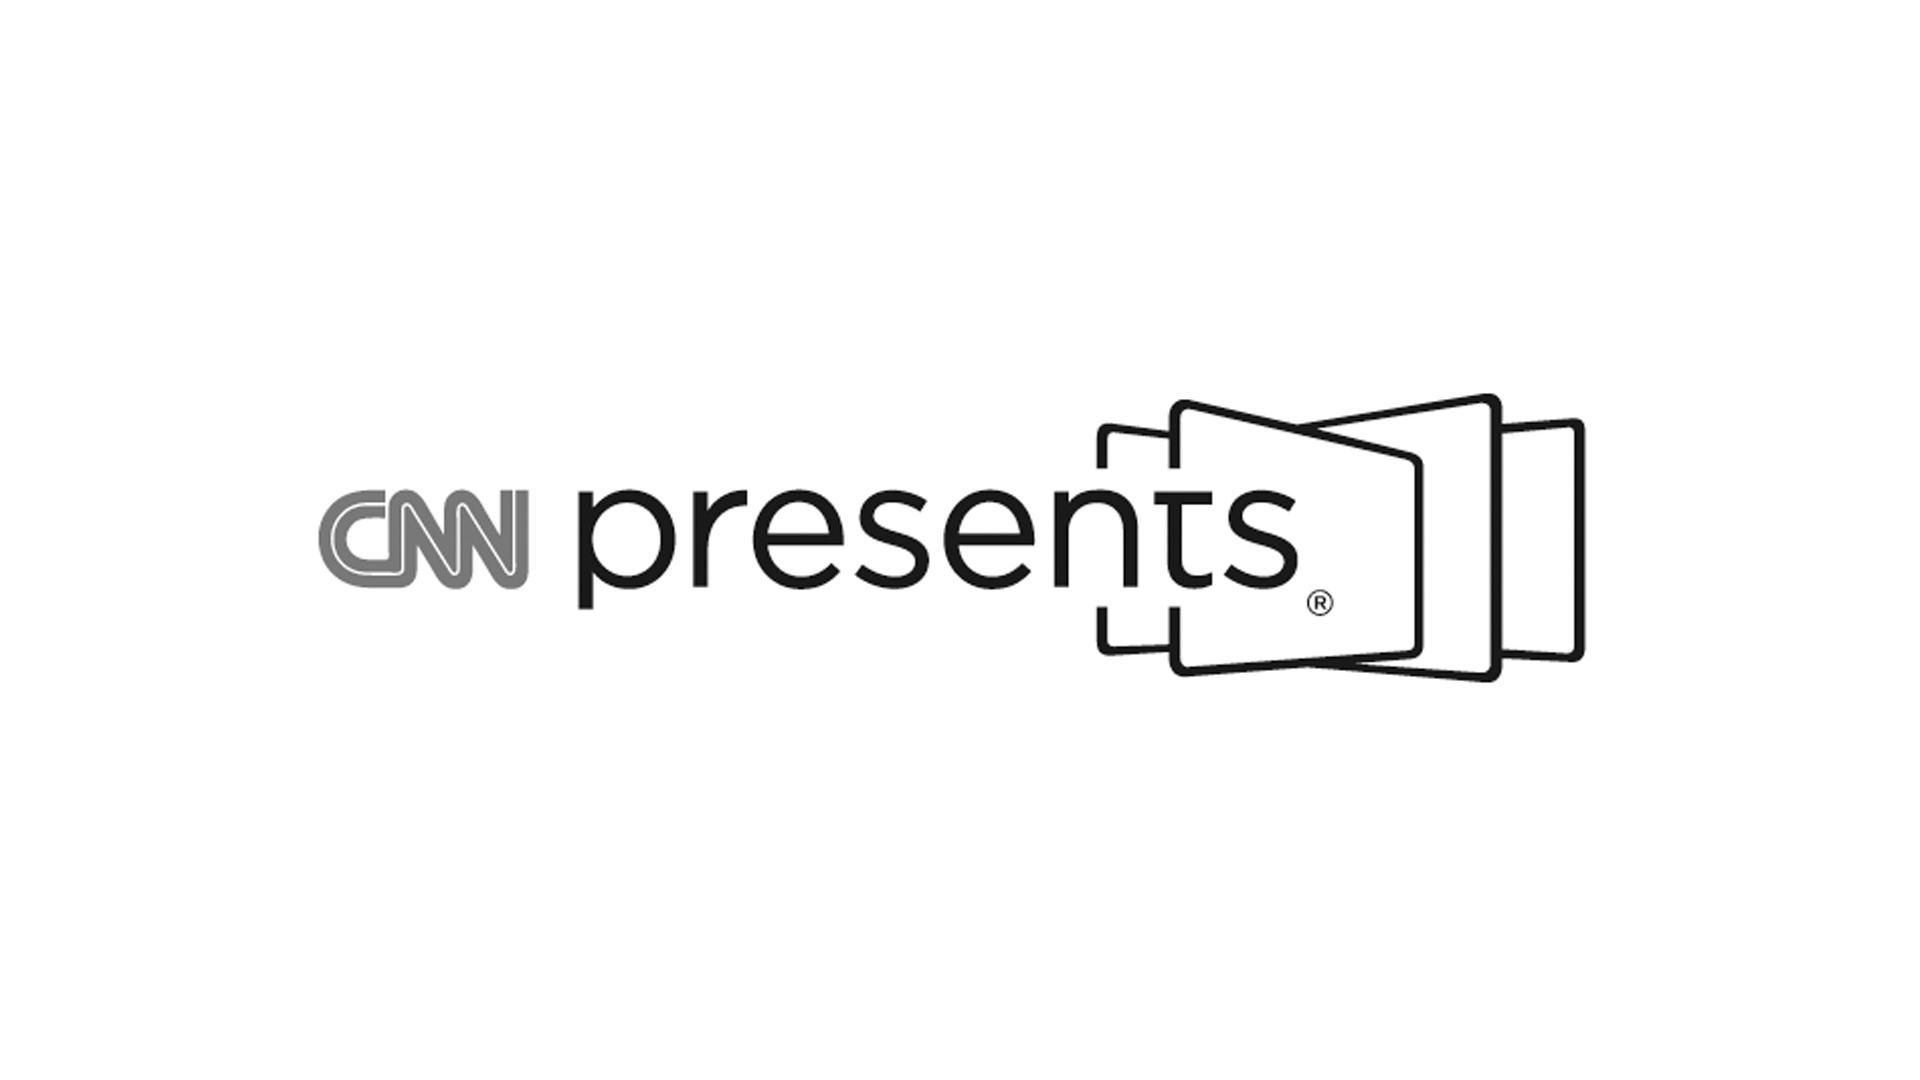 CNN PRESENTS LOGO